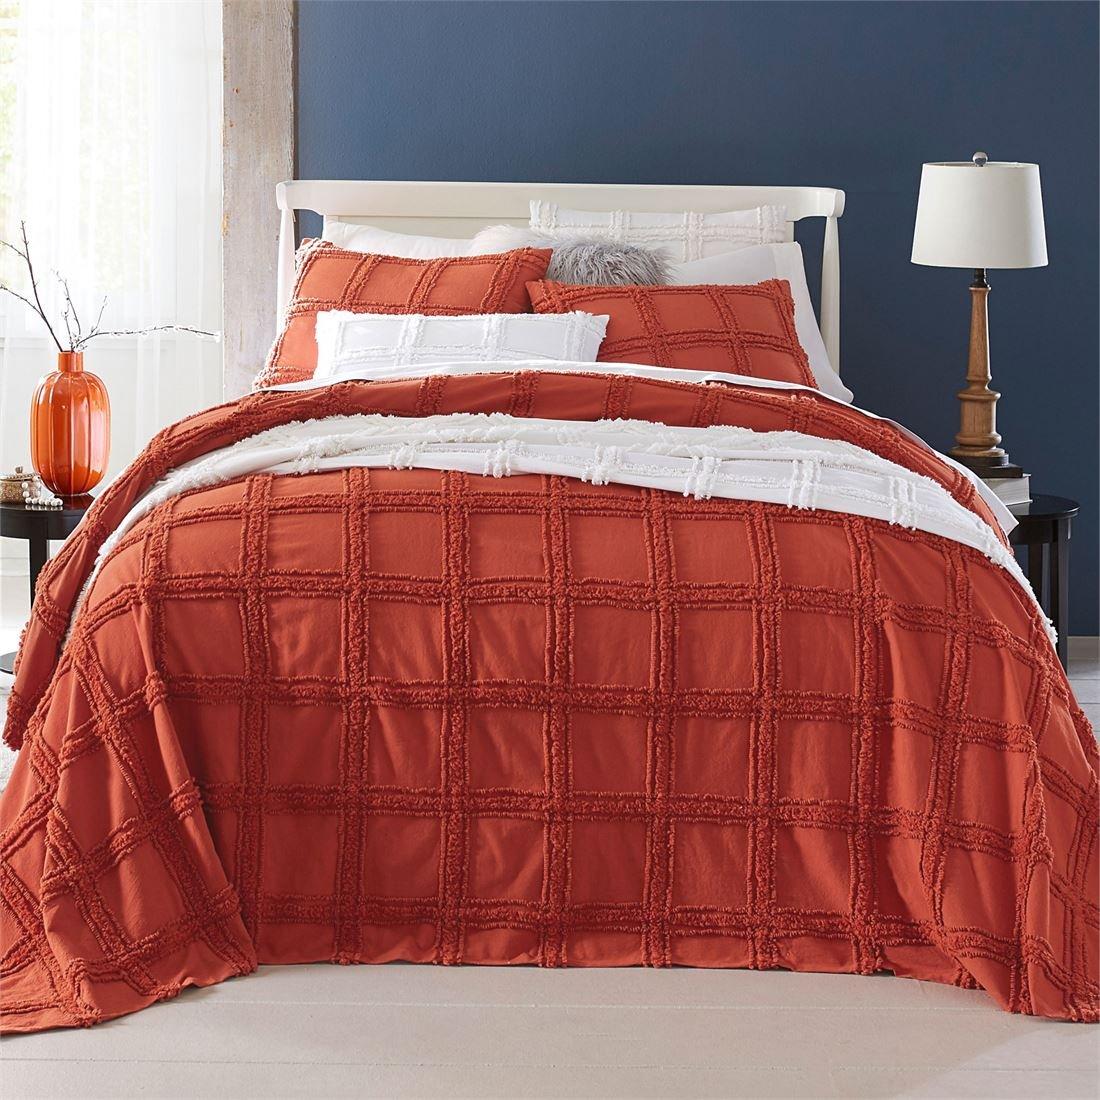 BrylaneHome Window Pane Chenille Bedspread (Terracotta,Full)